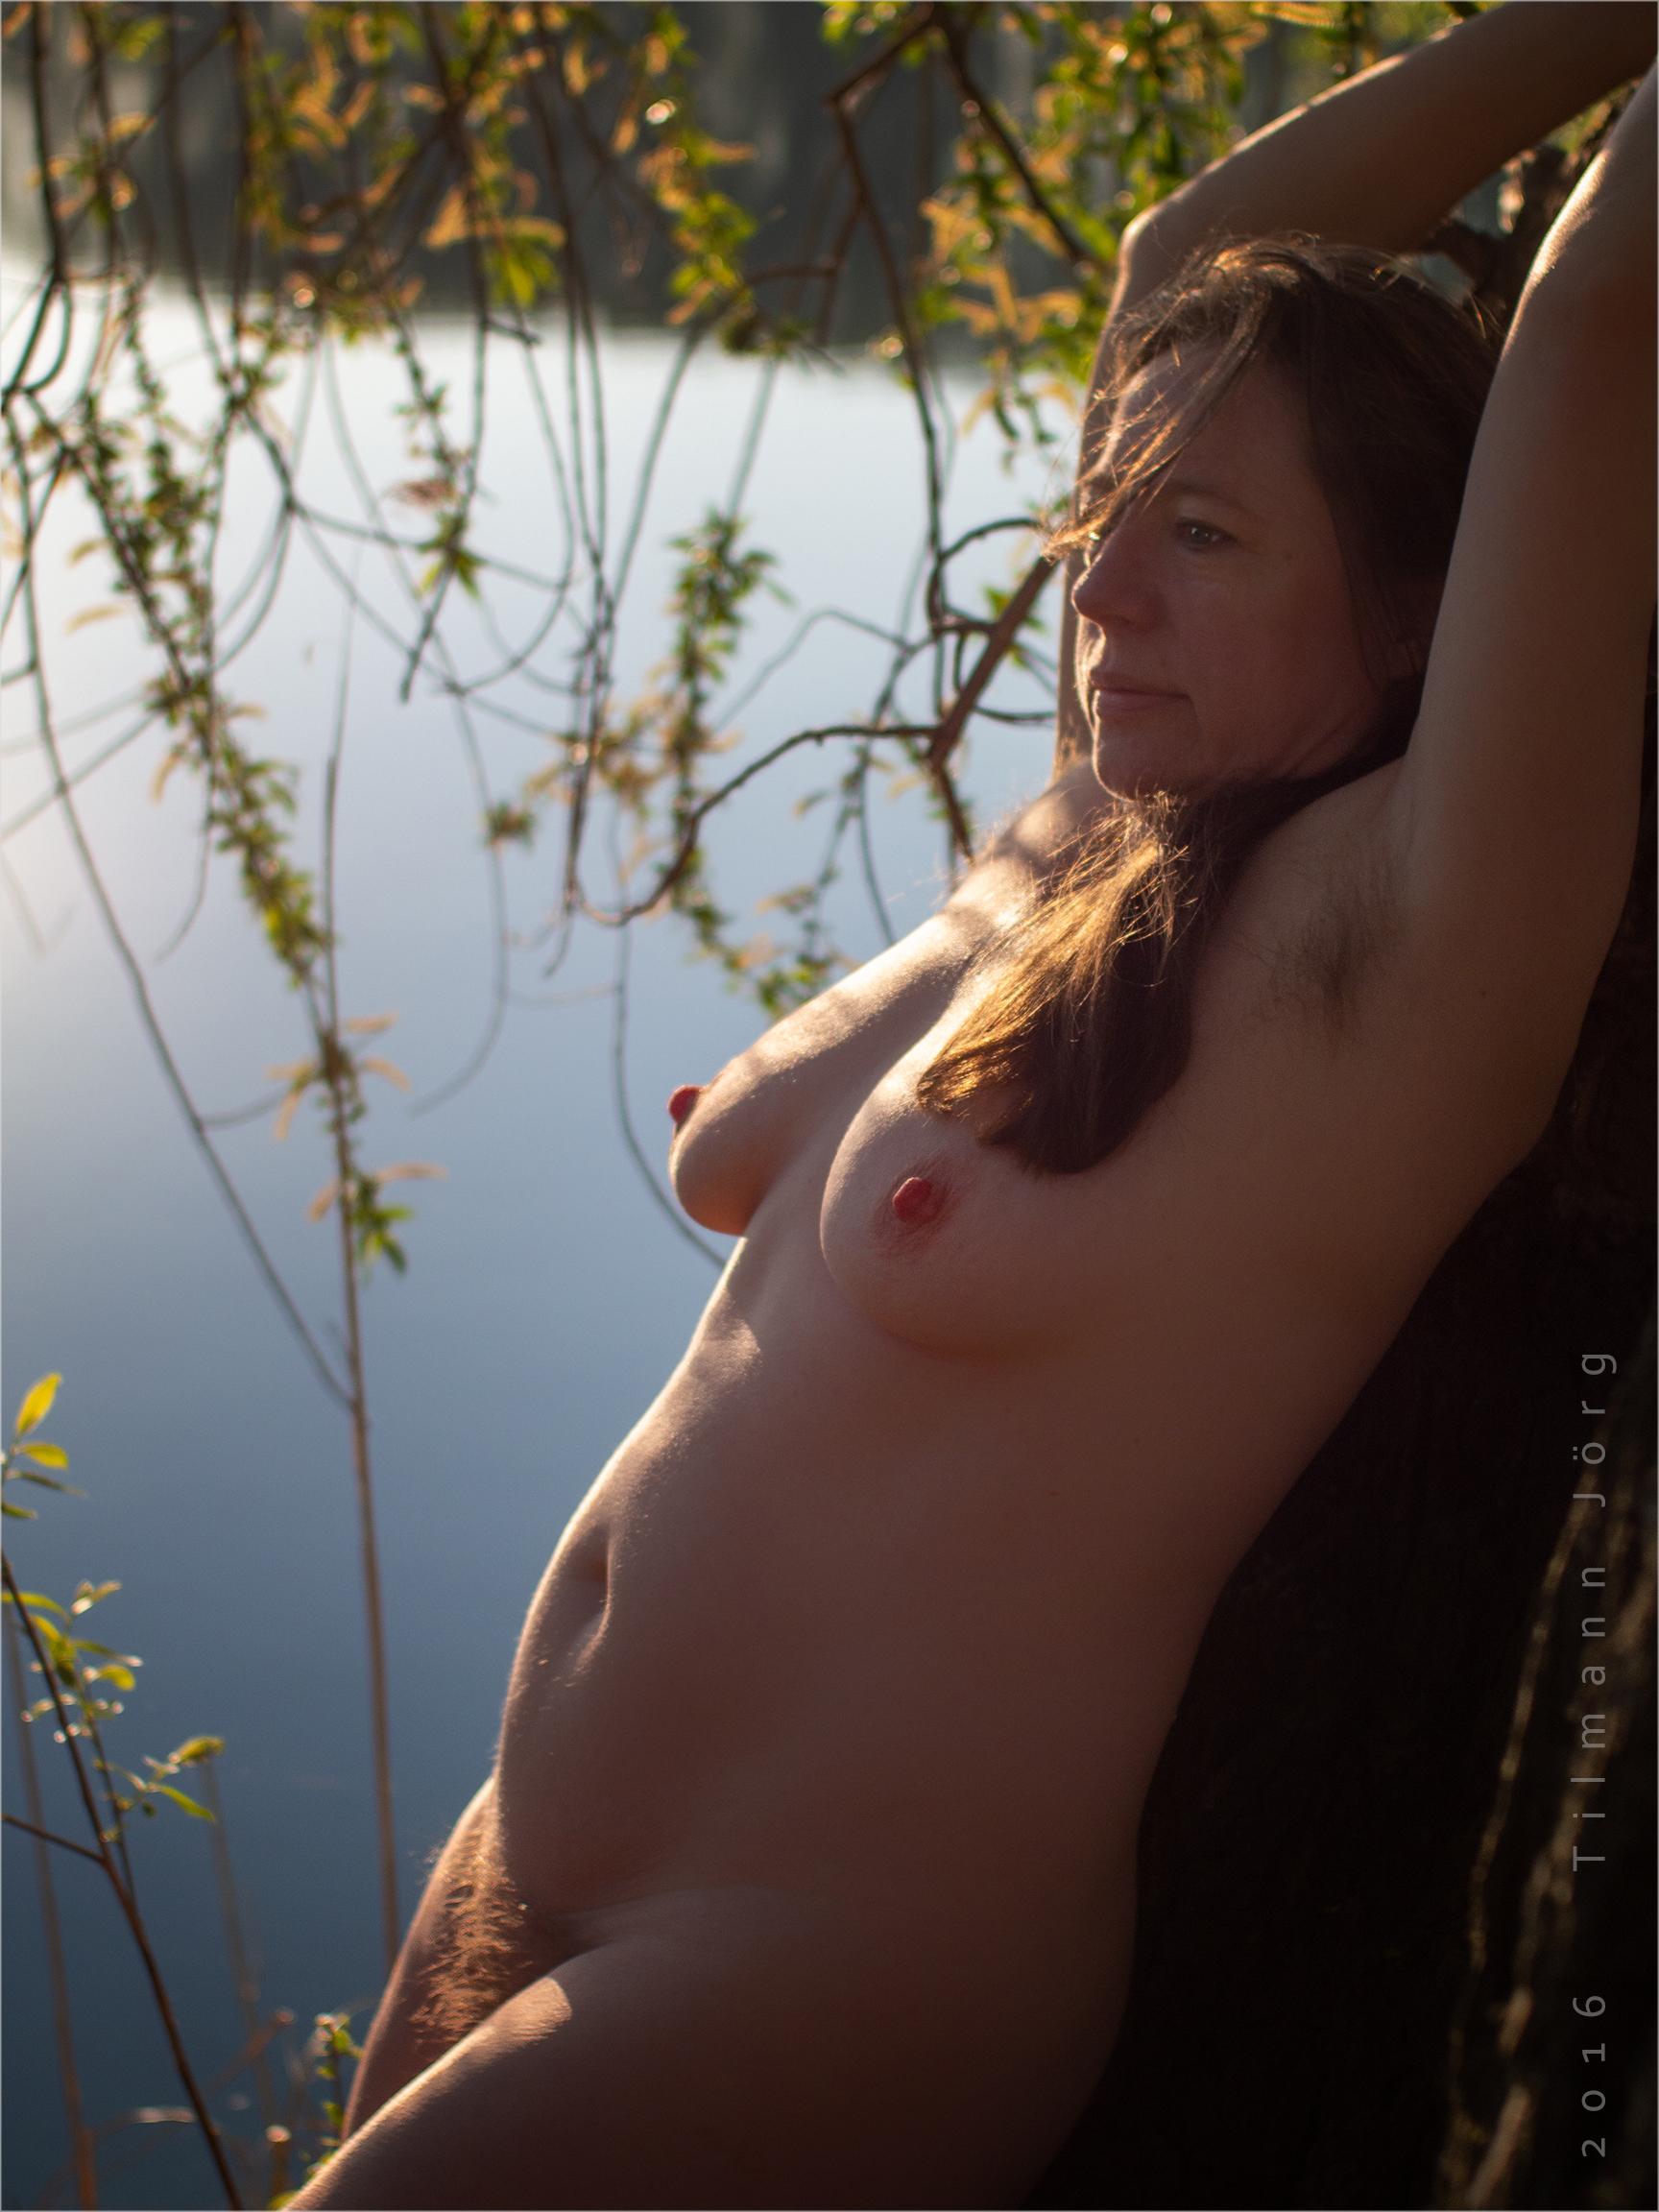 nackte Frau am Seeufer lehnt an einem Baum